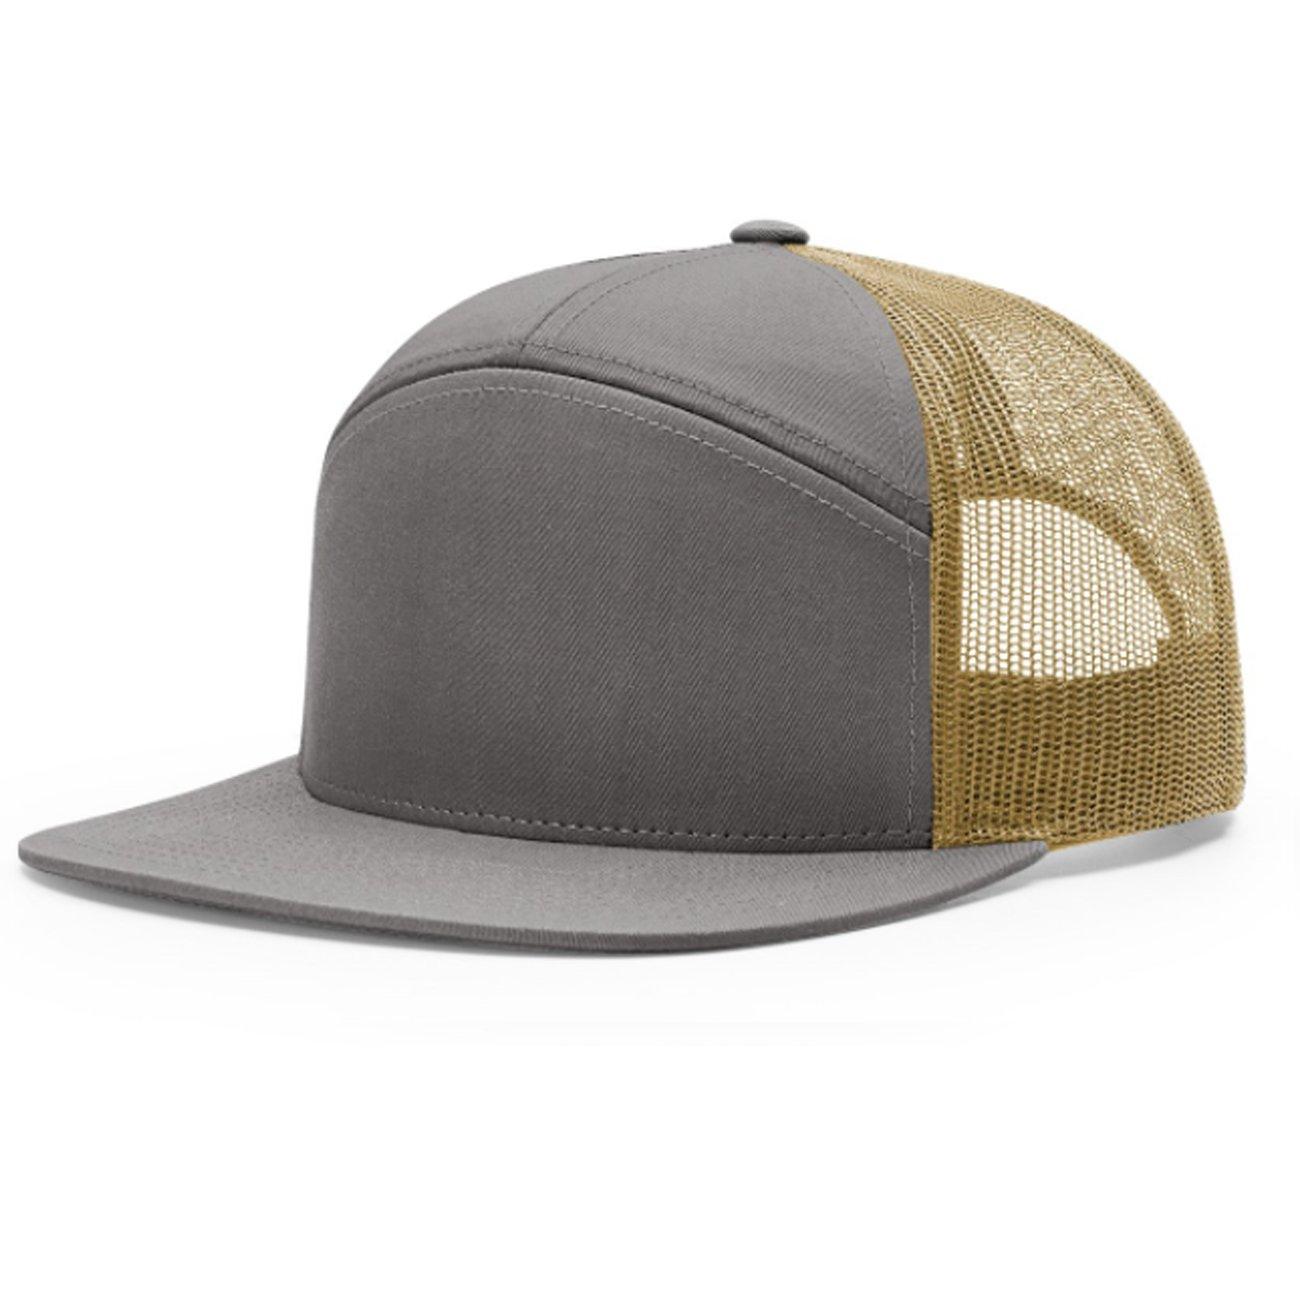 c3b5c054a3b Amazon.com  2040USA Richardson 7 Panel Mesh Trucker Hat (Charcoal Burnt  Orange Black)  Clothing